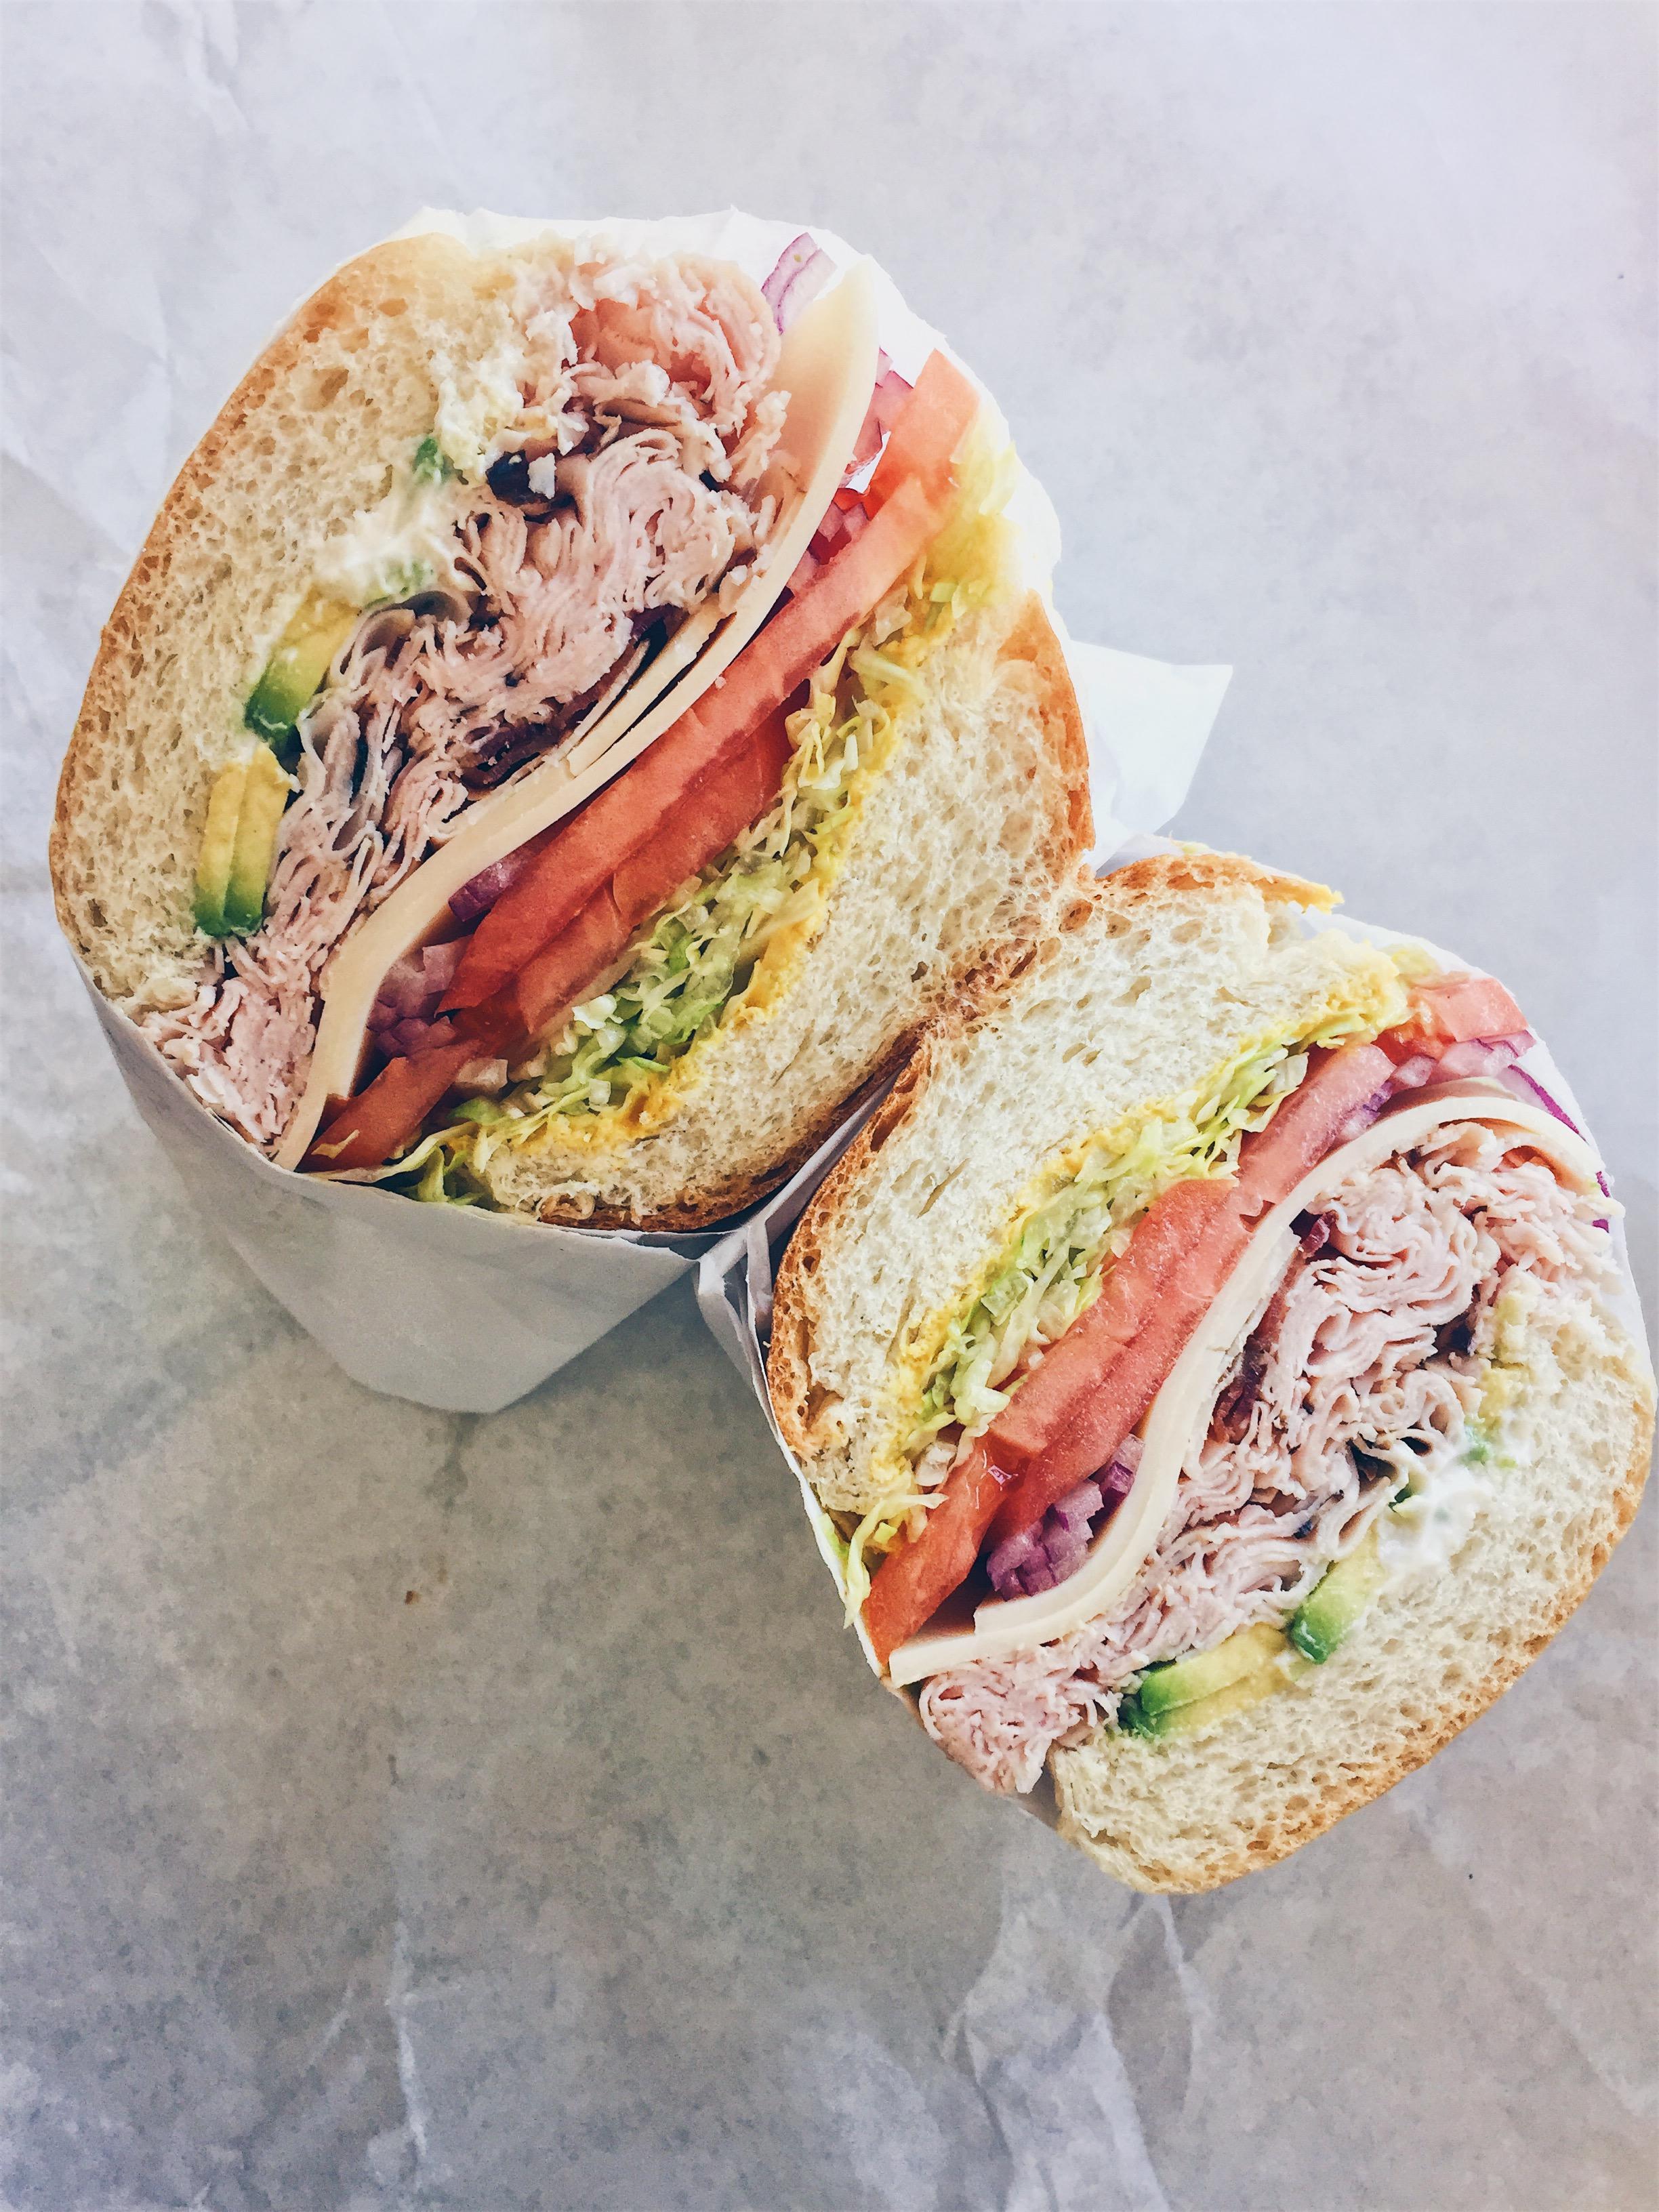 Los Angeles, USA - Mike's Deli / Boar Head - The Classic Club (Specialty Sandwiches) - helloteri